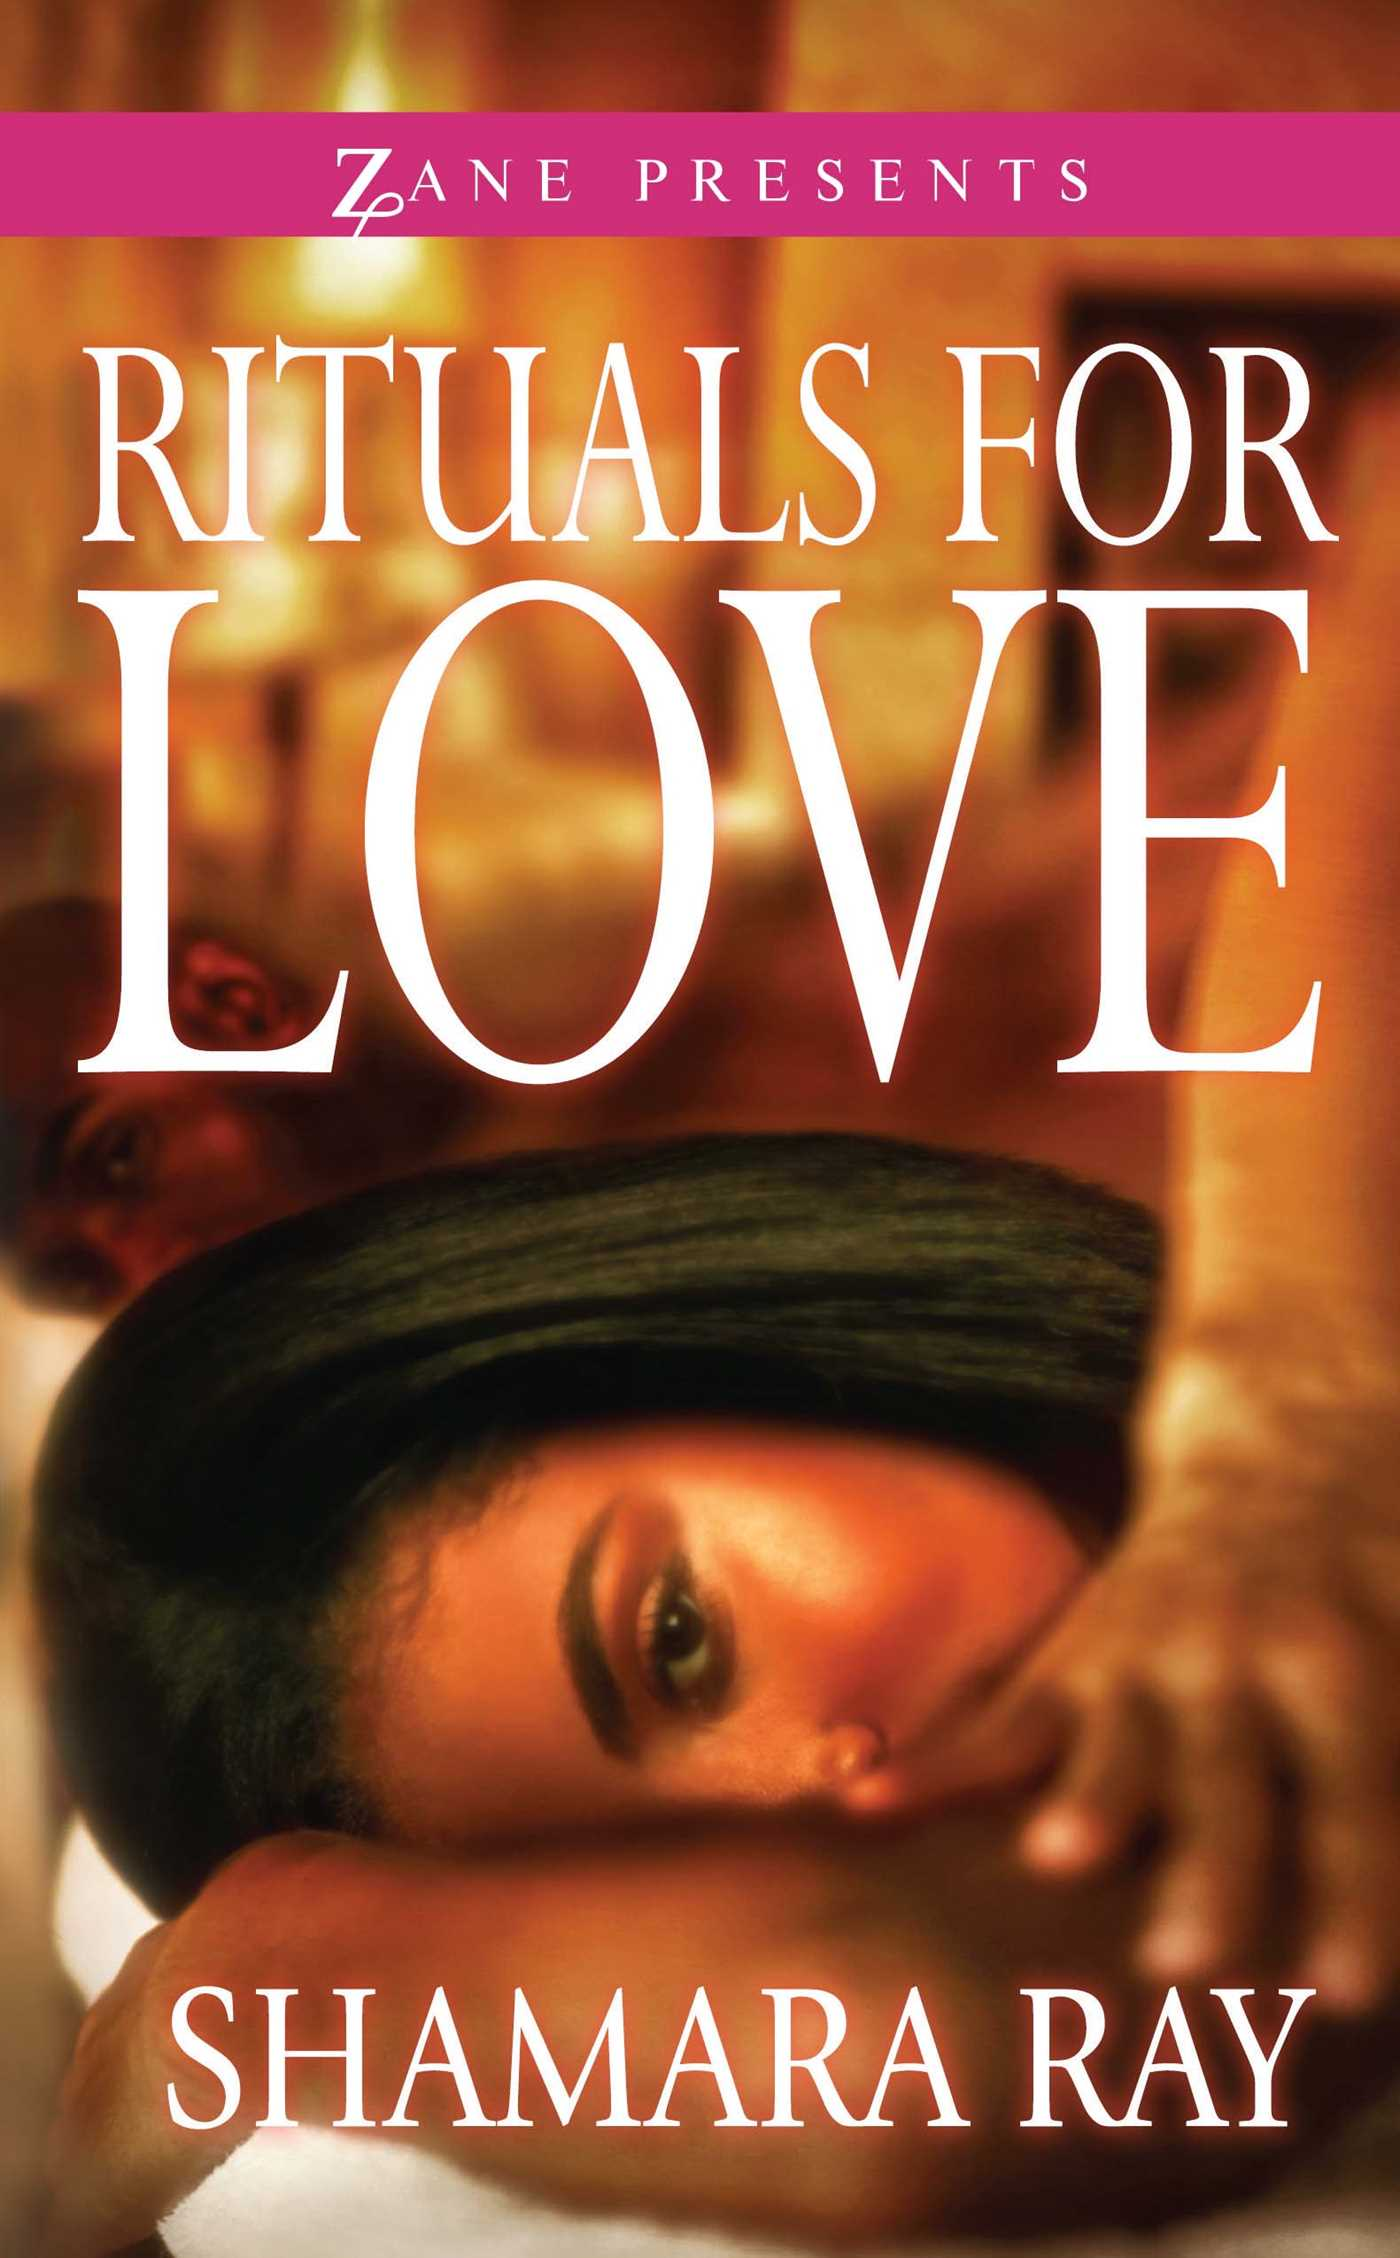 Rituals for love 9781593095864 hr